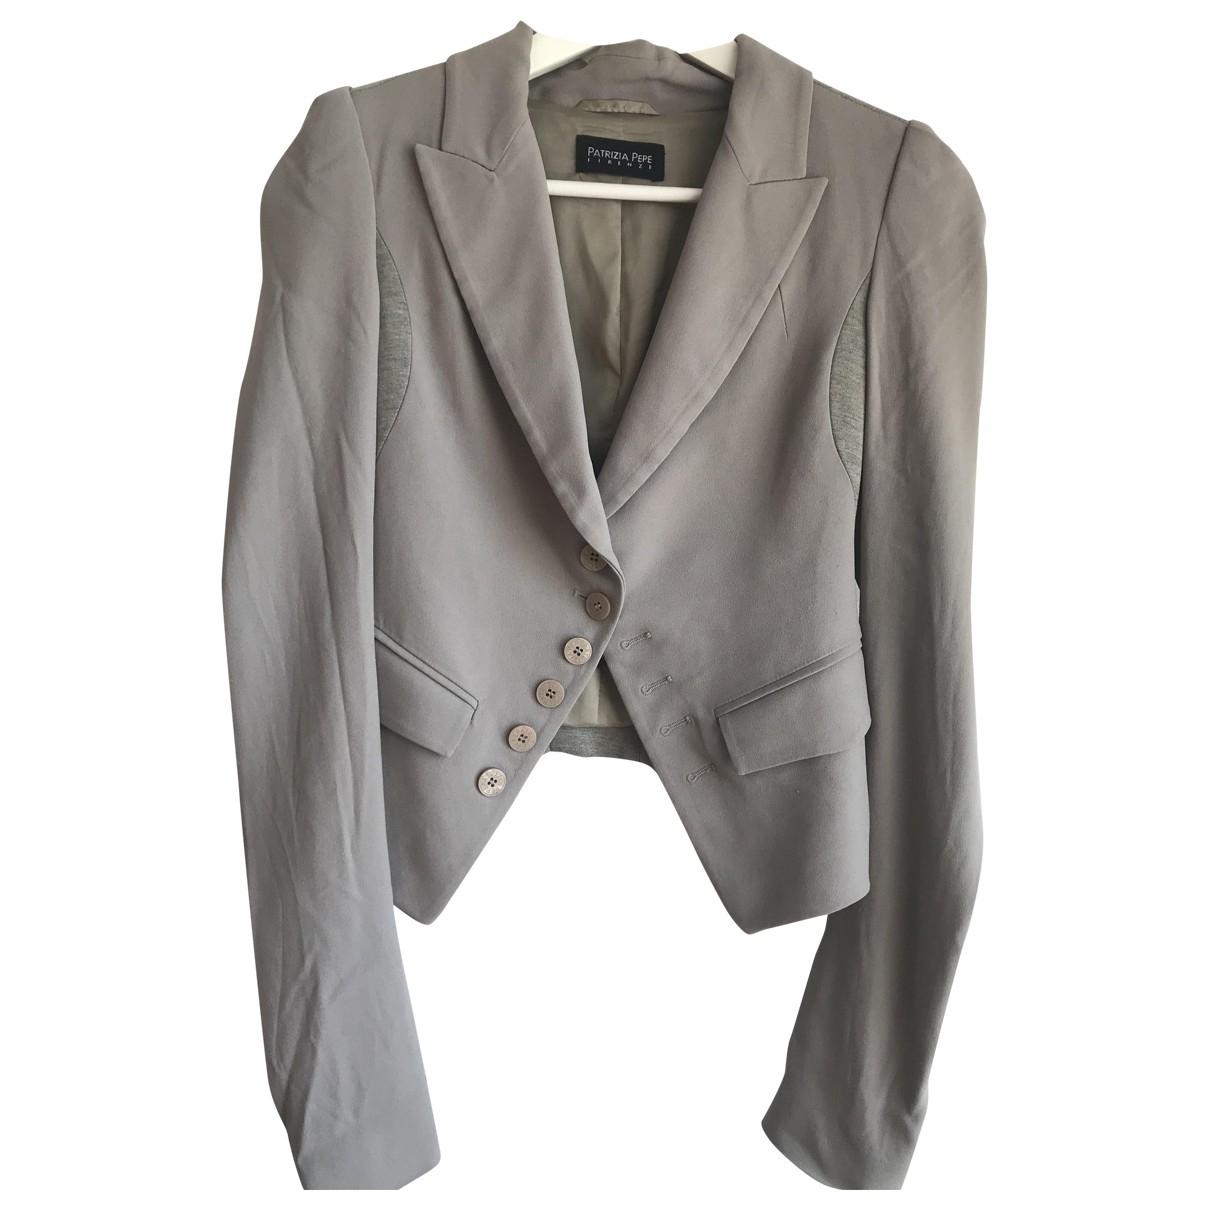 Patrizia Pepe \N Khaki jacket for Women 40 IT